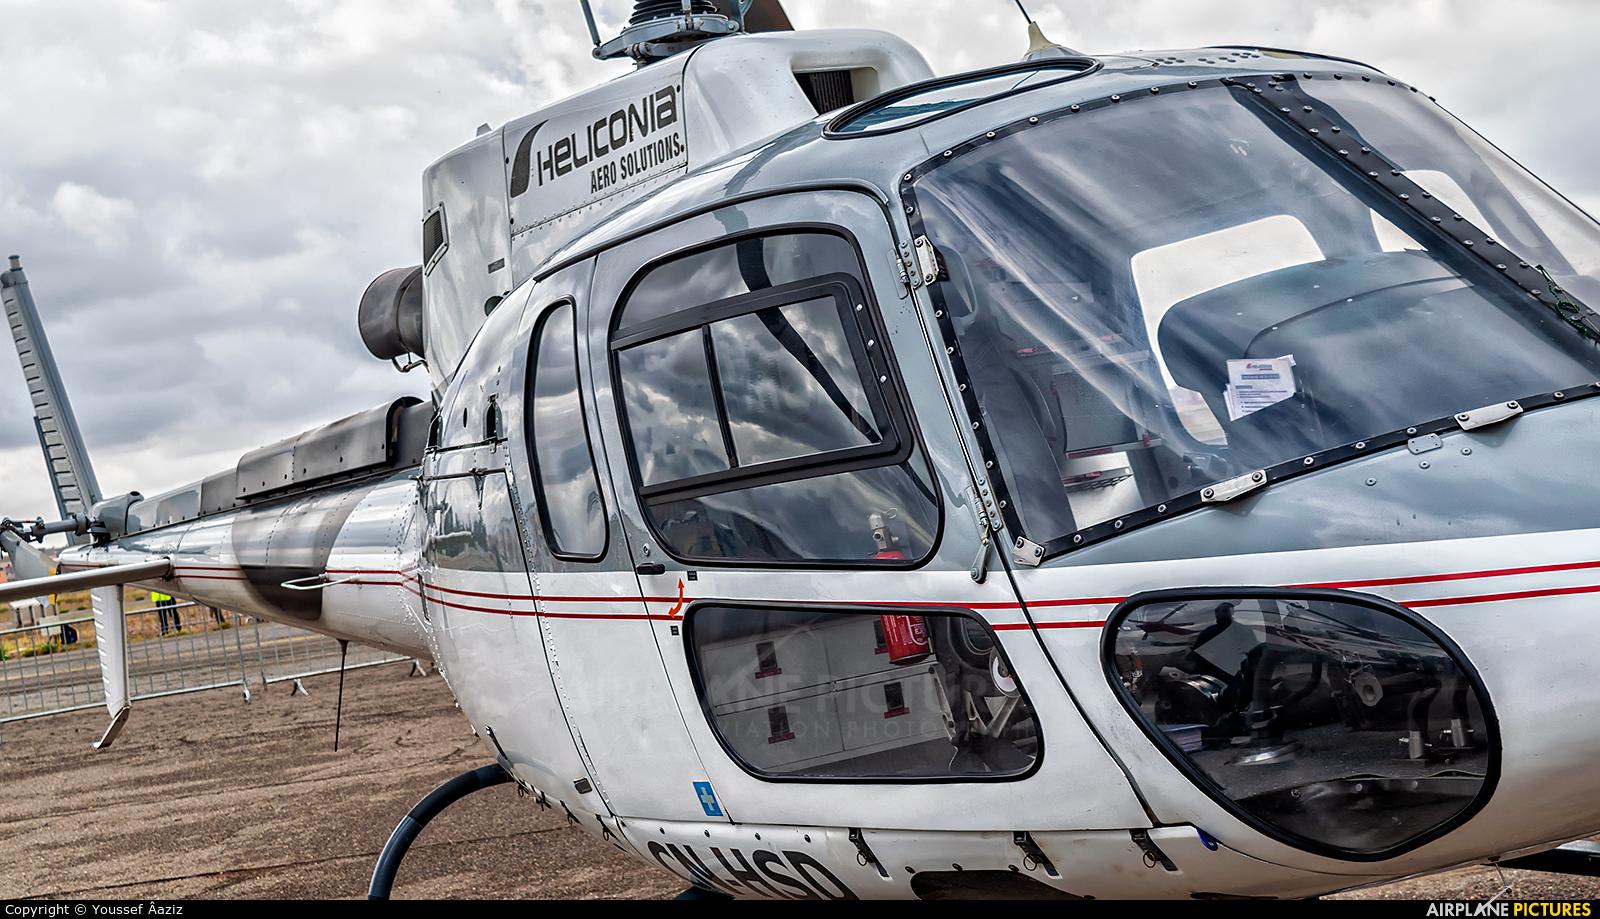 Heliconia Aero Solutions CN-HSD aircraft at Marrakech - Menara